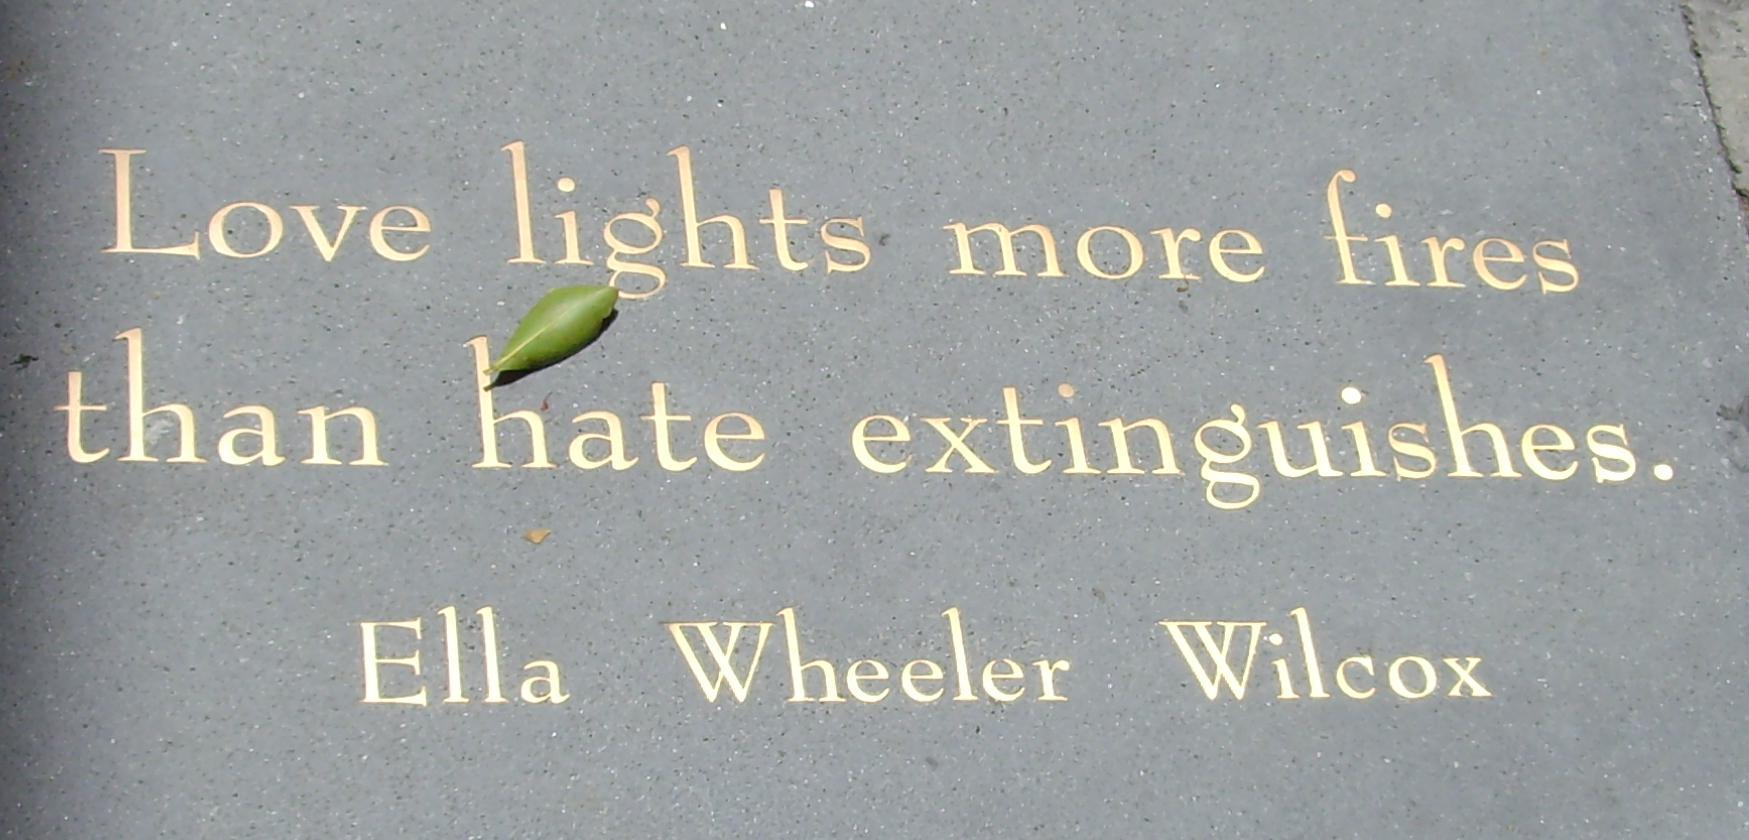 Ella Wheeler Wilcox quotation at City Lights Bookstore in San Francisco